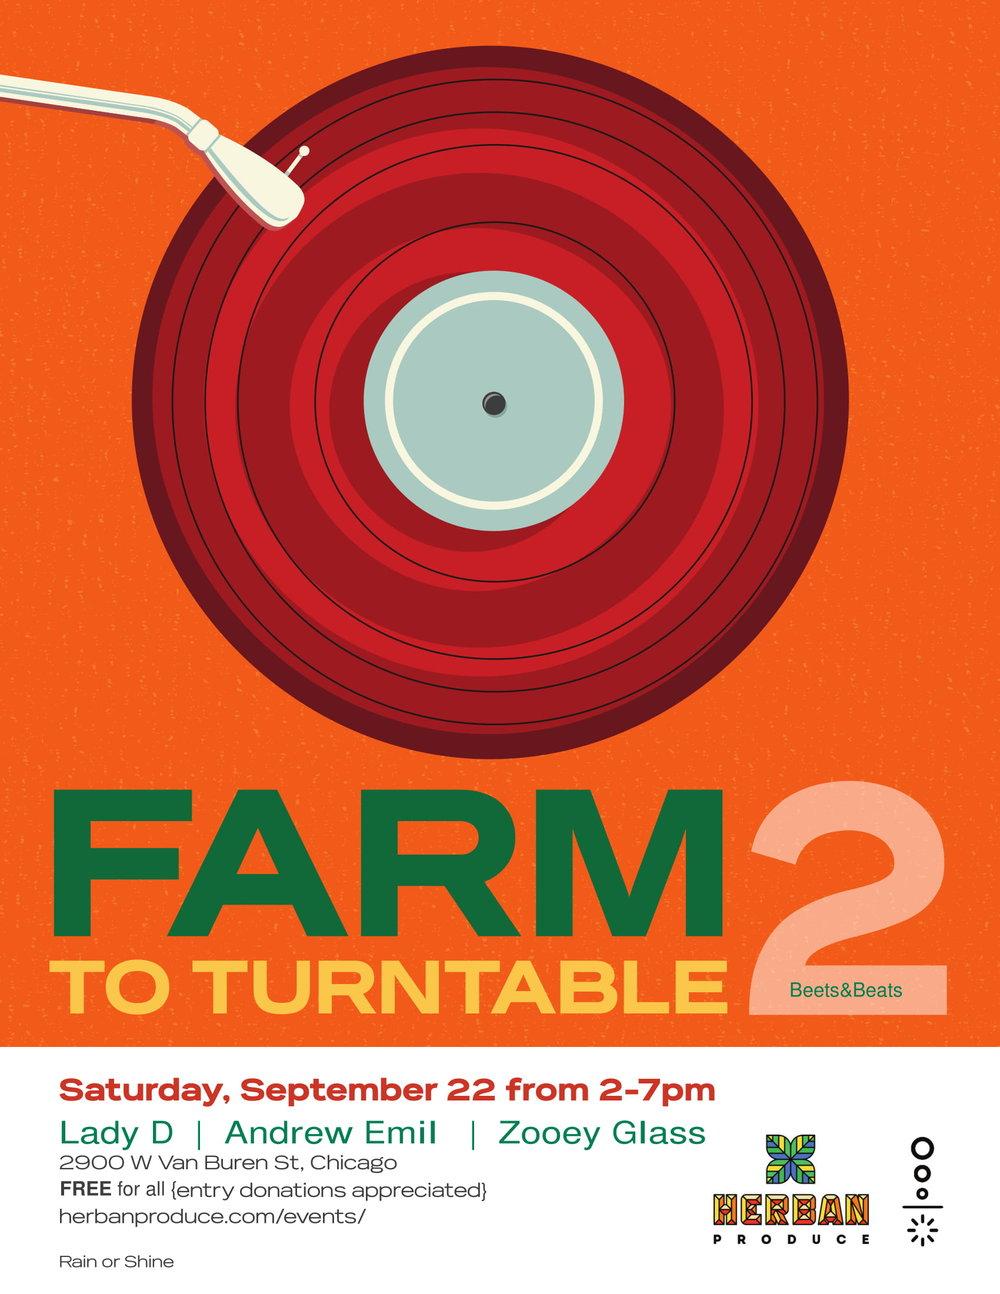 Farm-to-Turntable-Flyer 2 Final-1.jpg